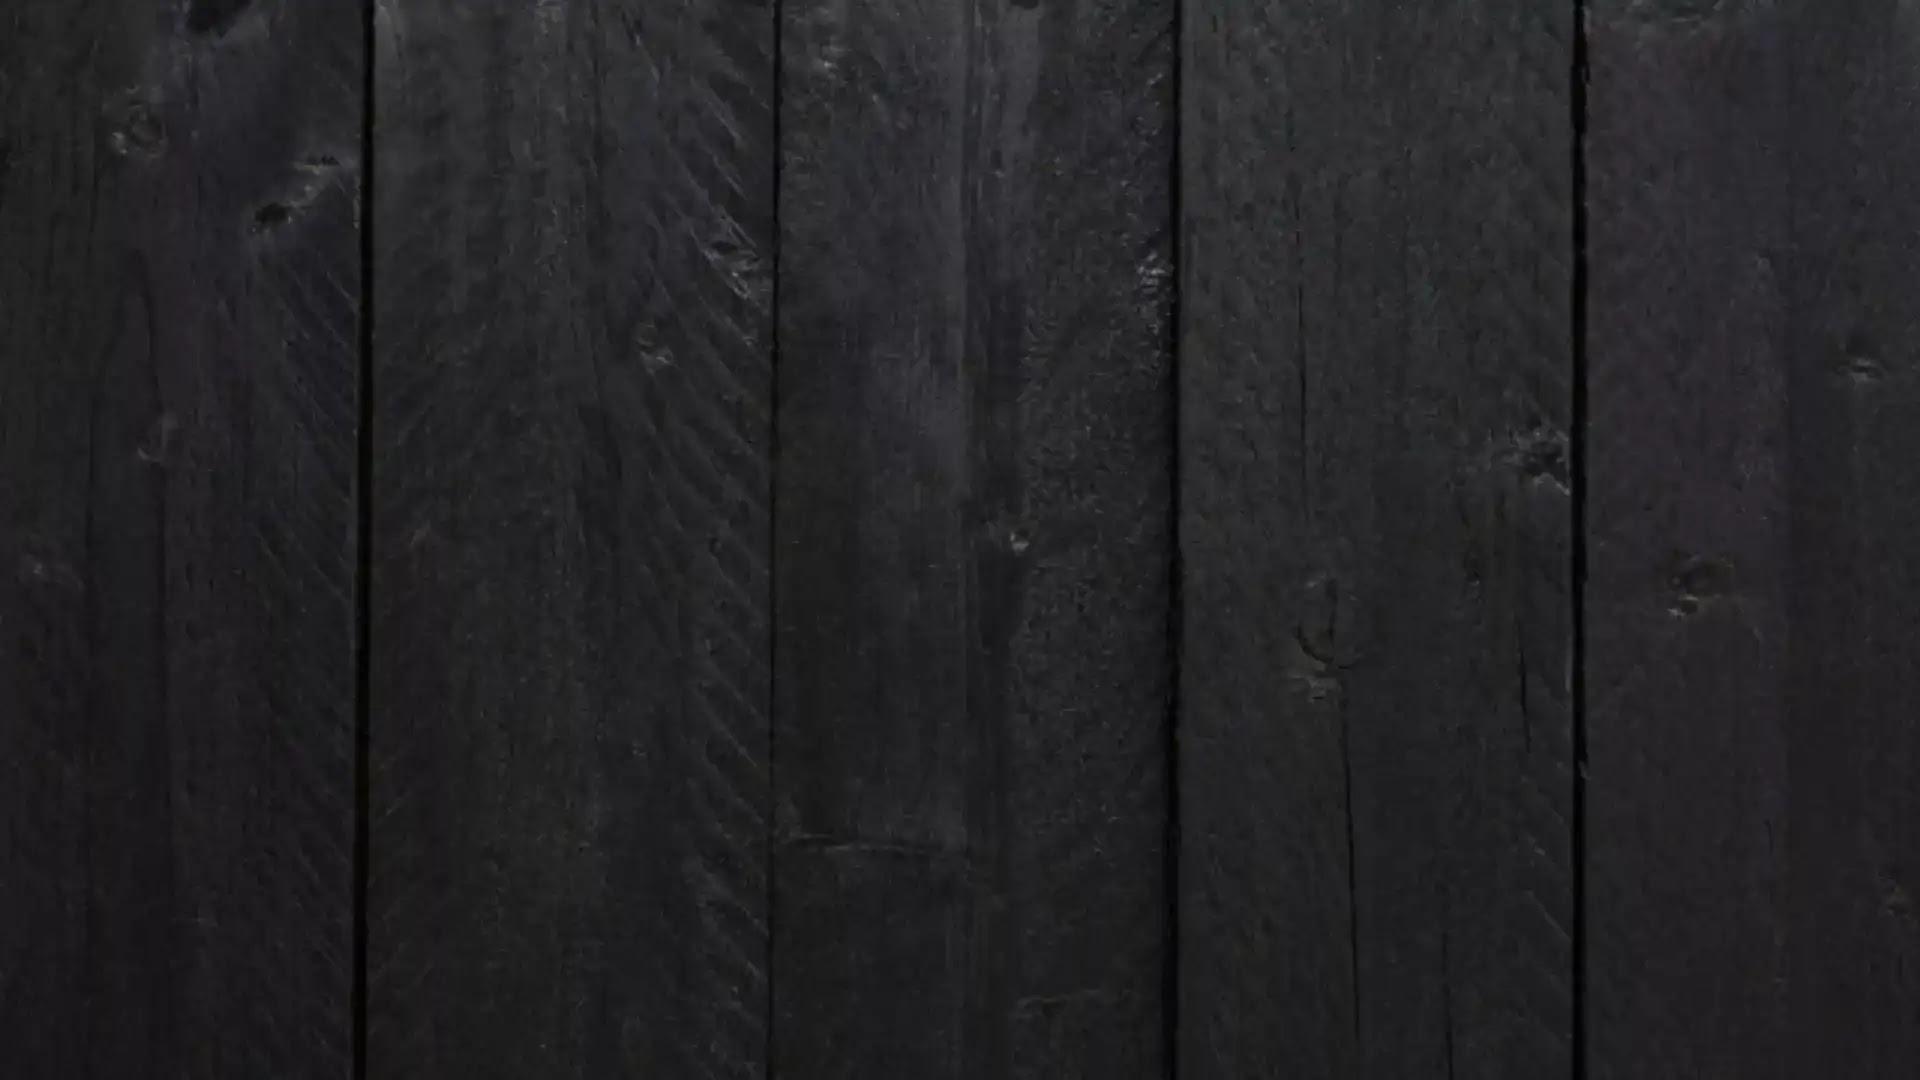 hd pure black wallpaper